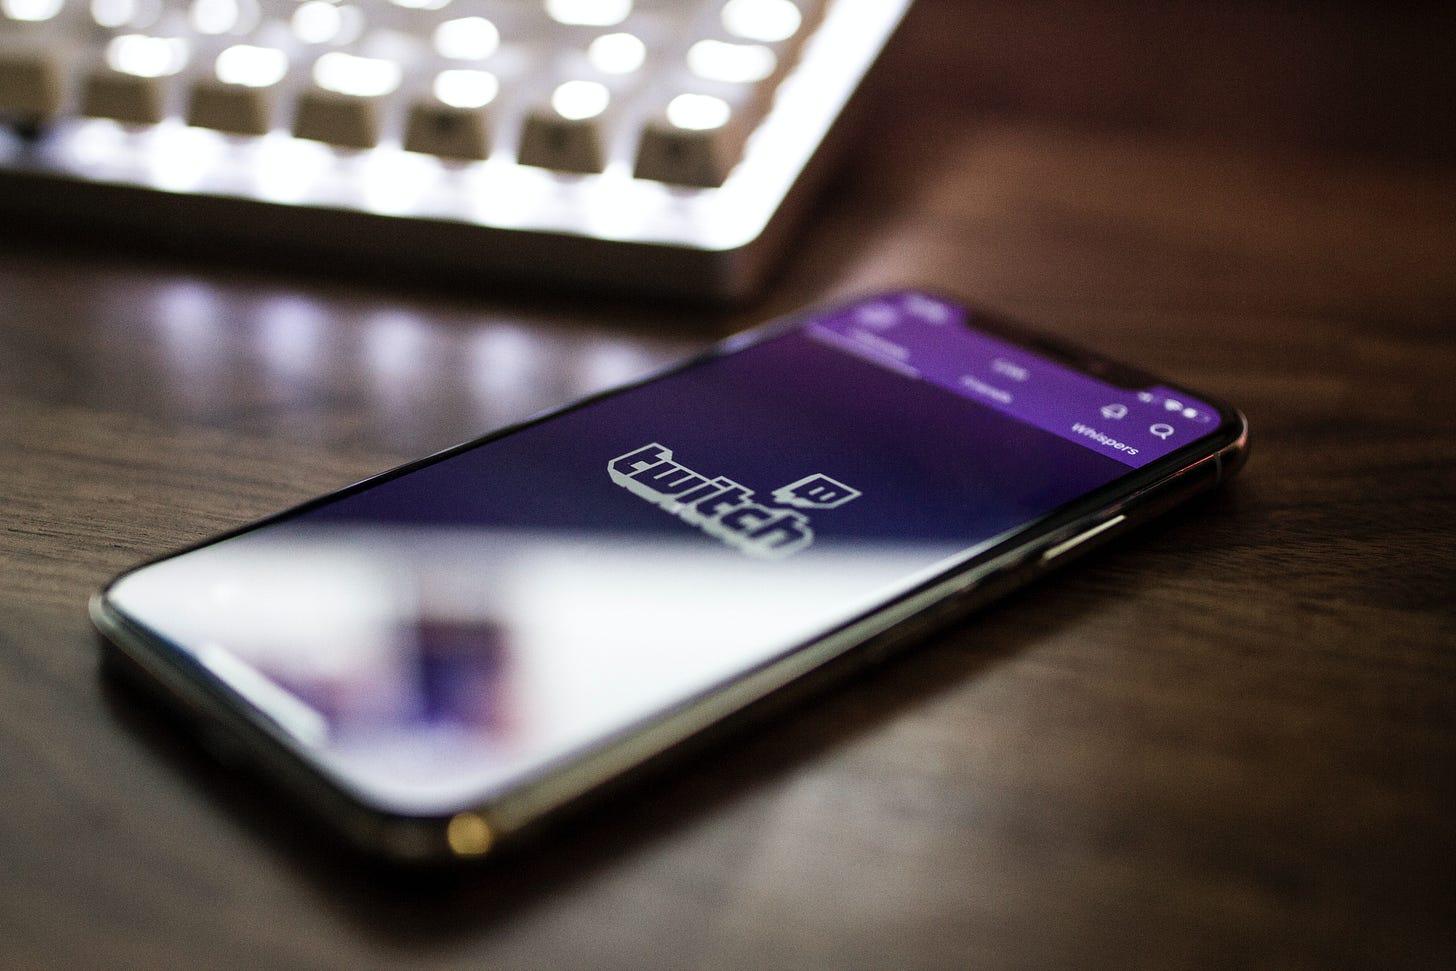 Twitch open on a smartphone. (Caspar Camille Rubin / Unsplash)